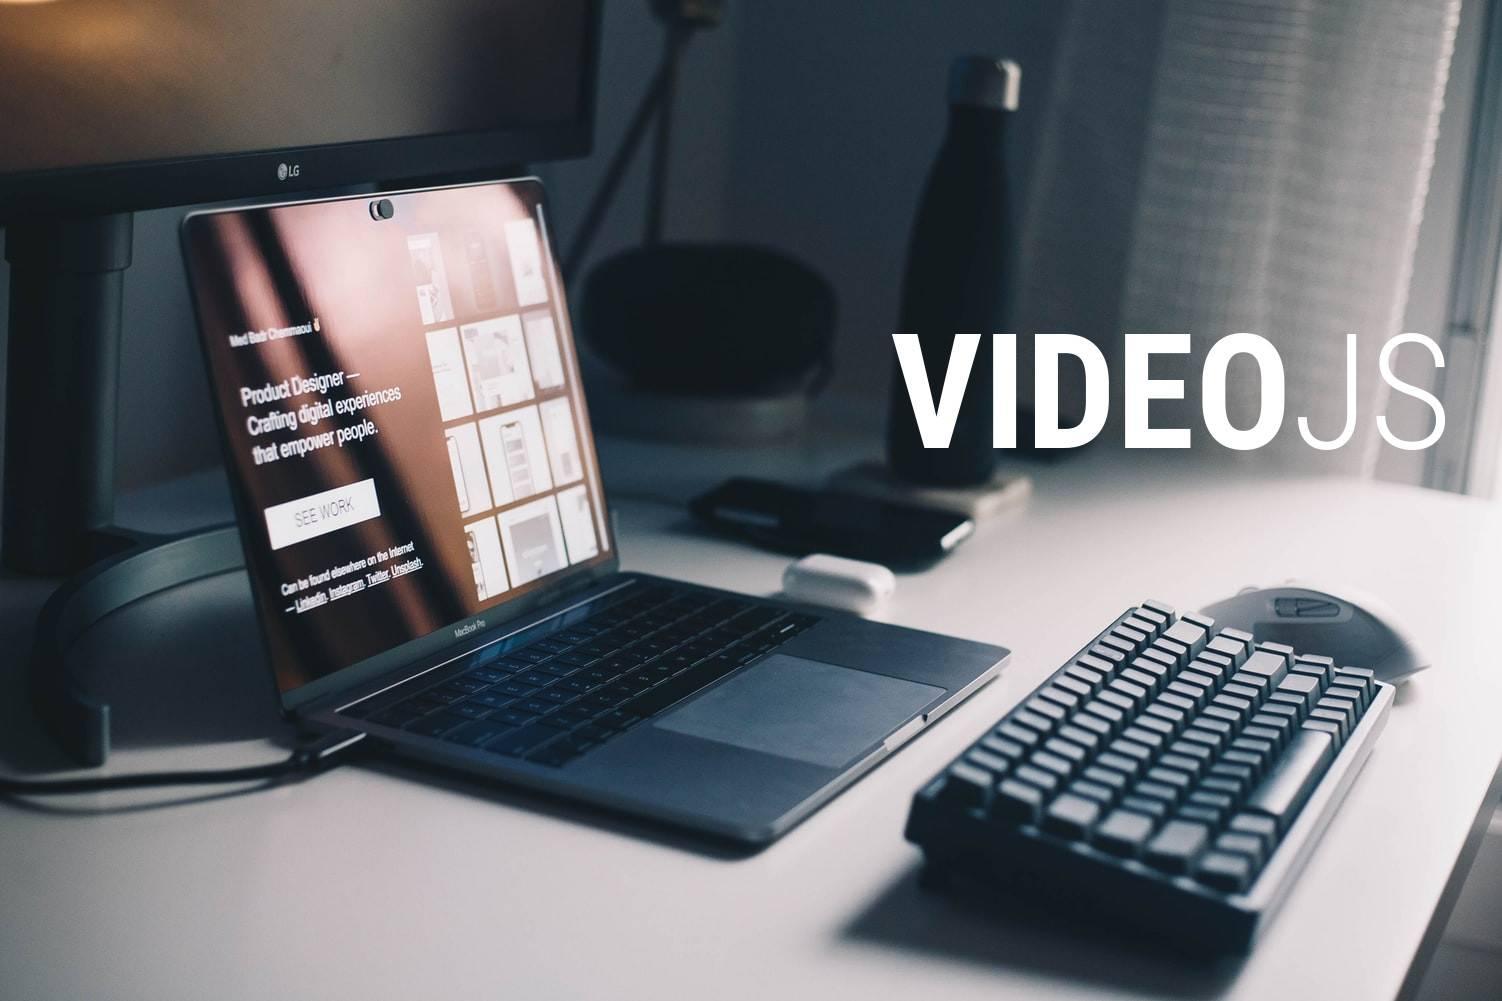 Cara Mudah Membuat Video Player Local maupun Online Terhubung dengan Google Drive Menggunakan VIDEOJS